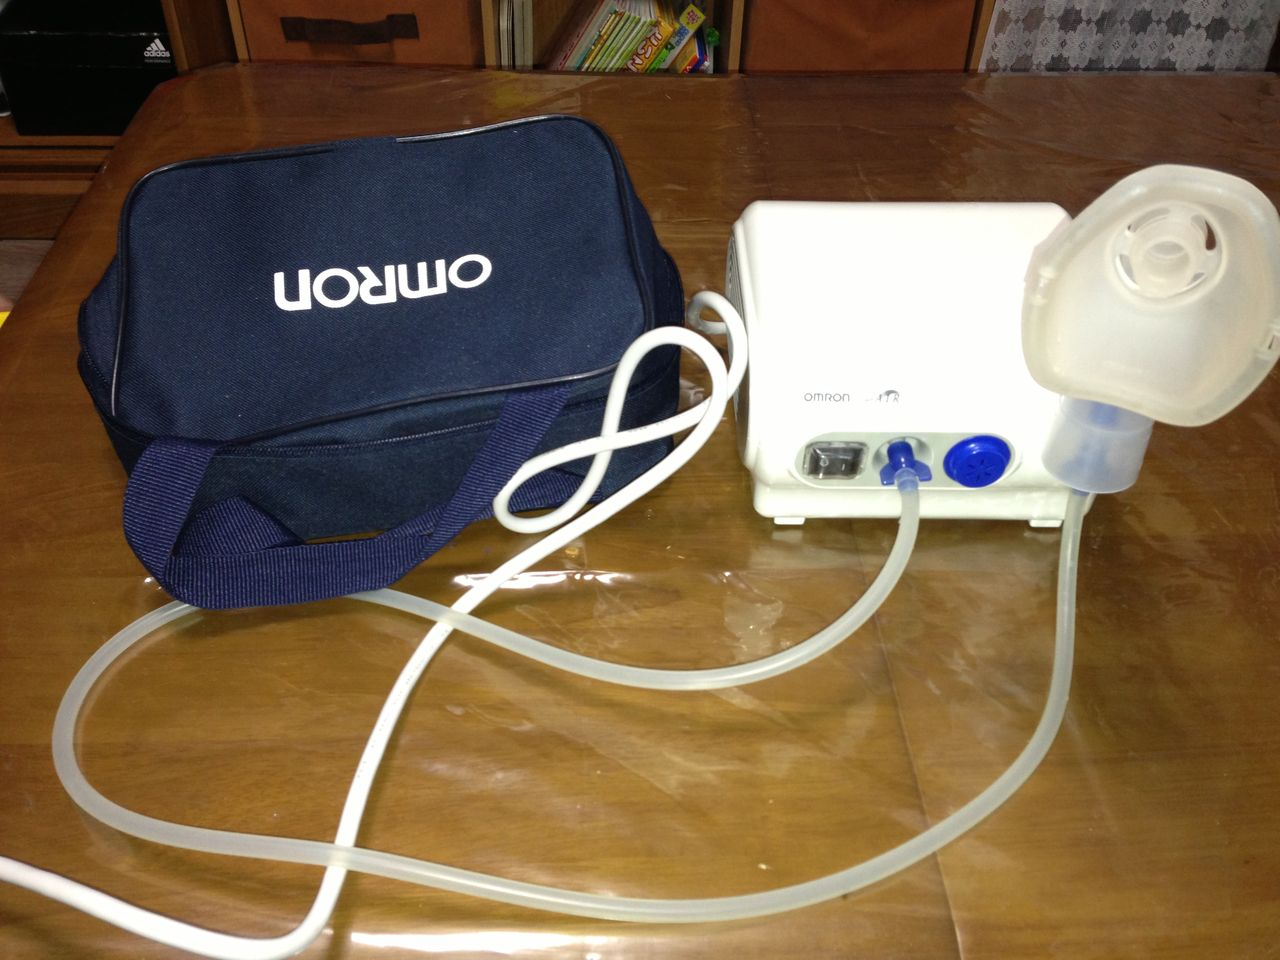 器 喘息 吸入 喘息の治療~吸引薬と吸入器